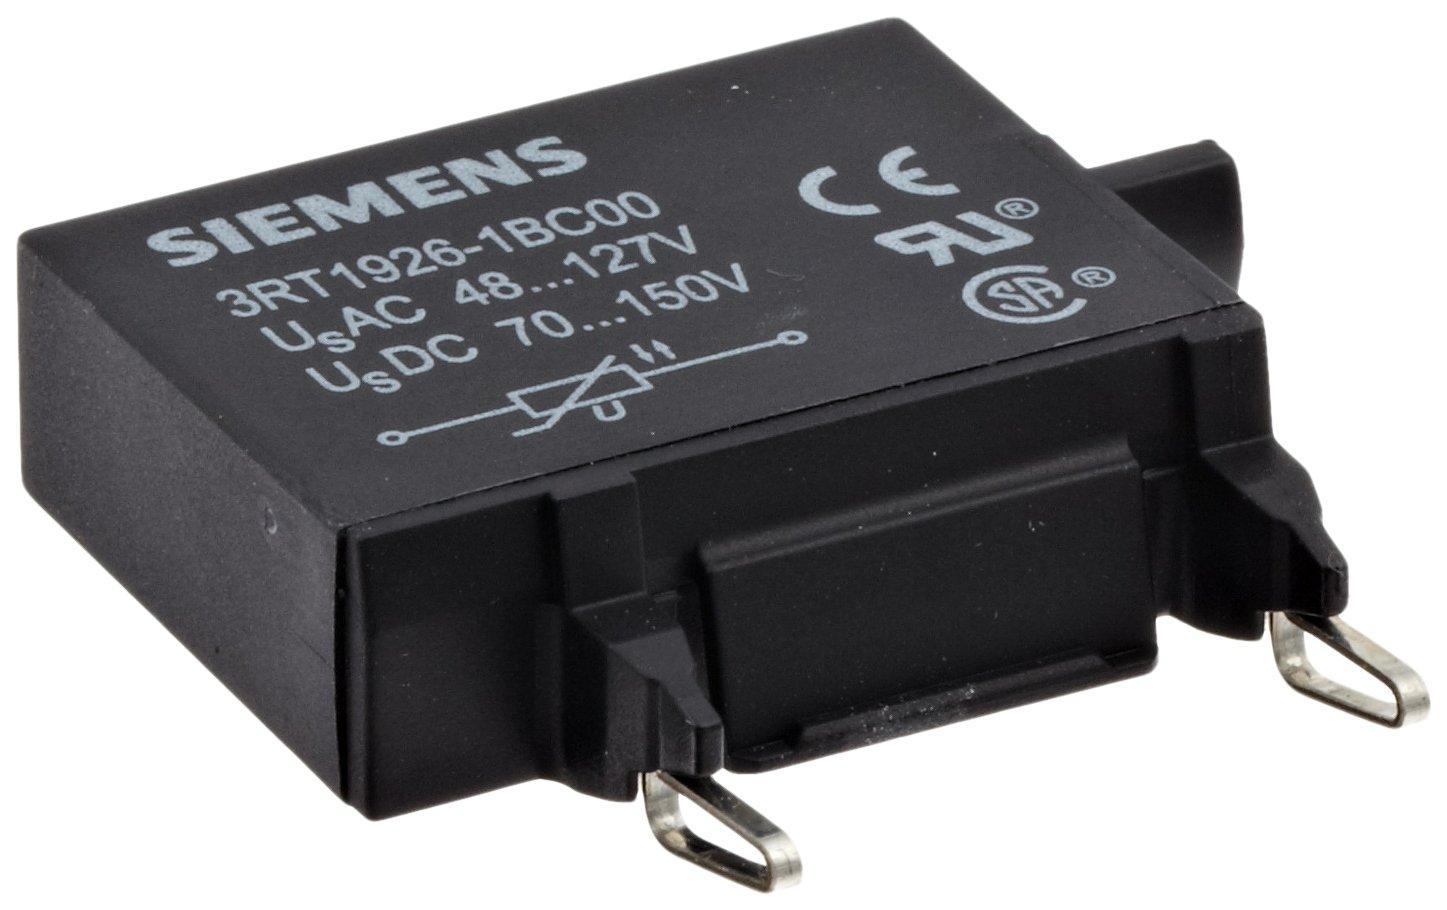 Siemens 3RT19 26-1BC00 Surge Suppressor, Varistor Design, S0 Size, 48-127VAC Rated Control Supply Voltage